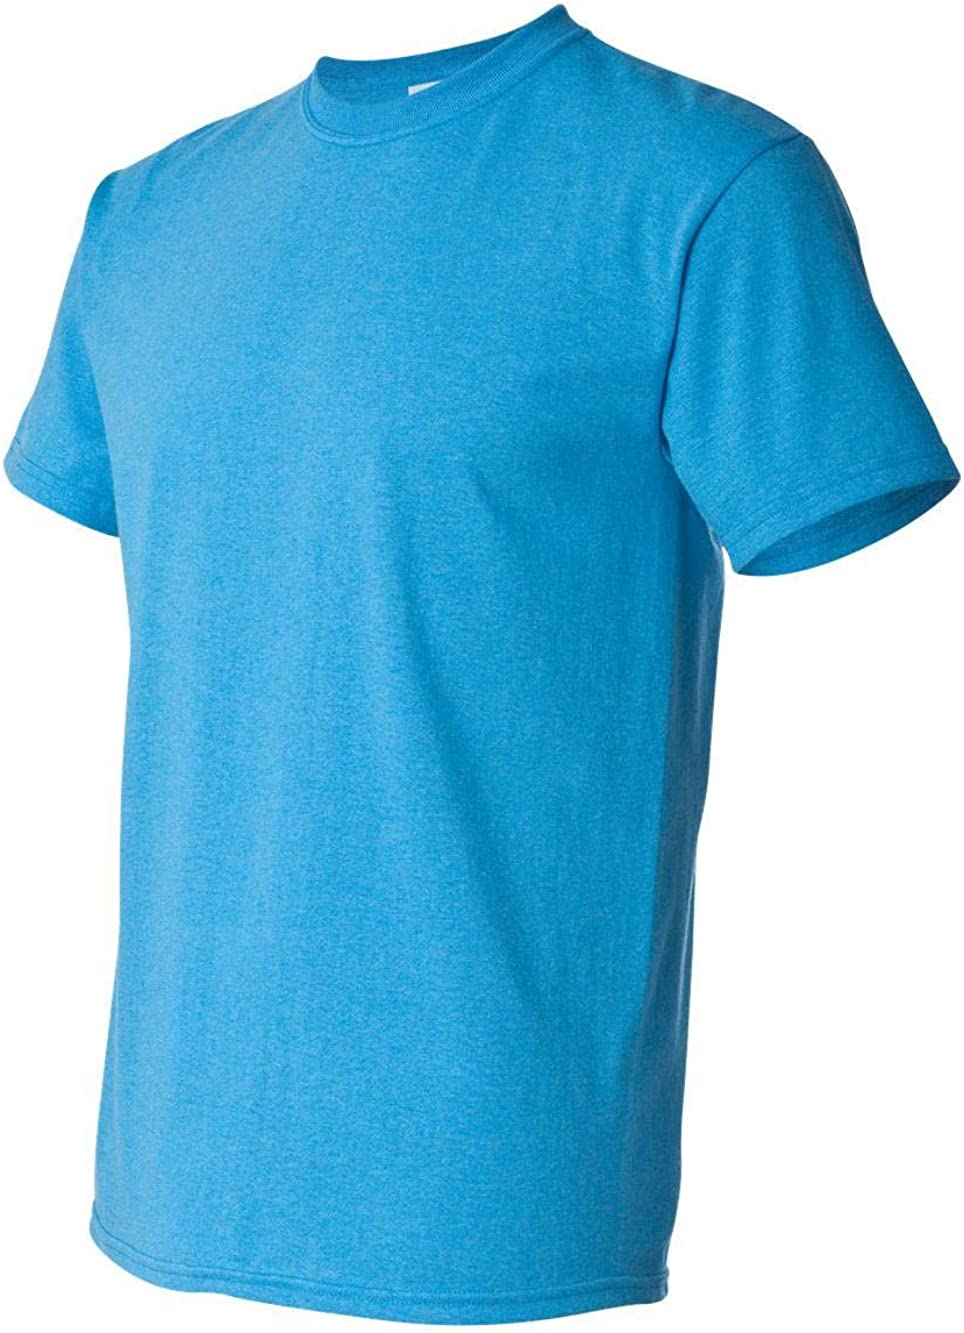 Gildan 5000 Adult Heavy Cotton T-Shirt, Heather Sapphire, XXX-Large